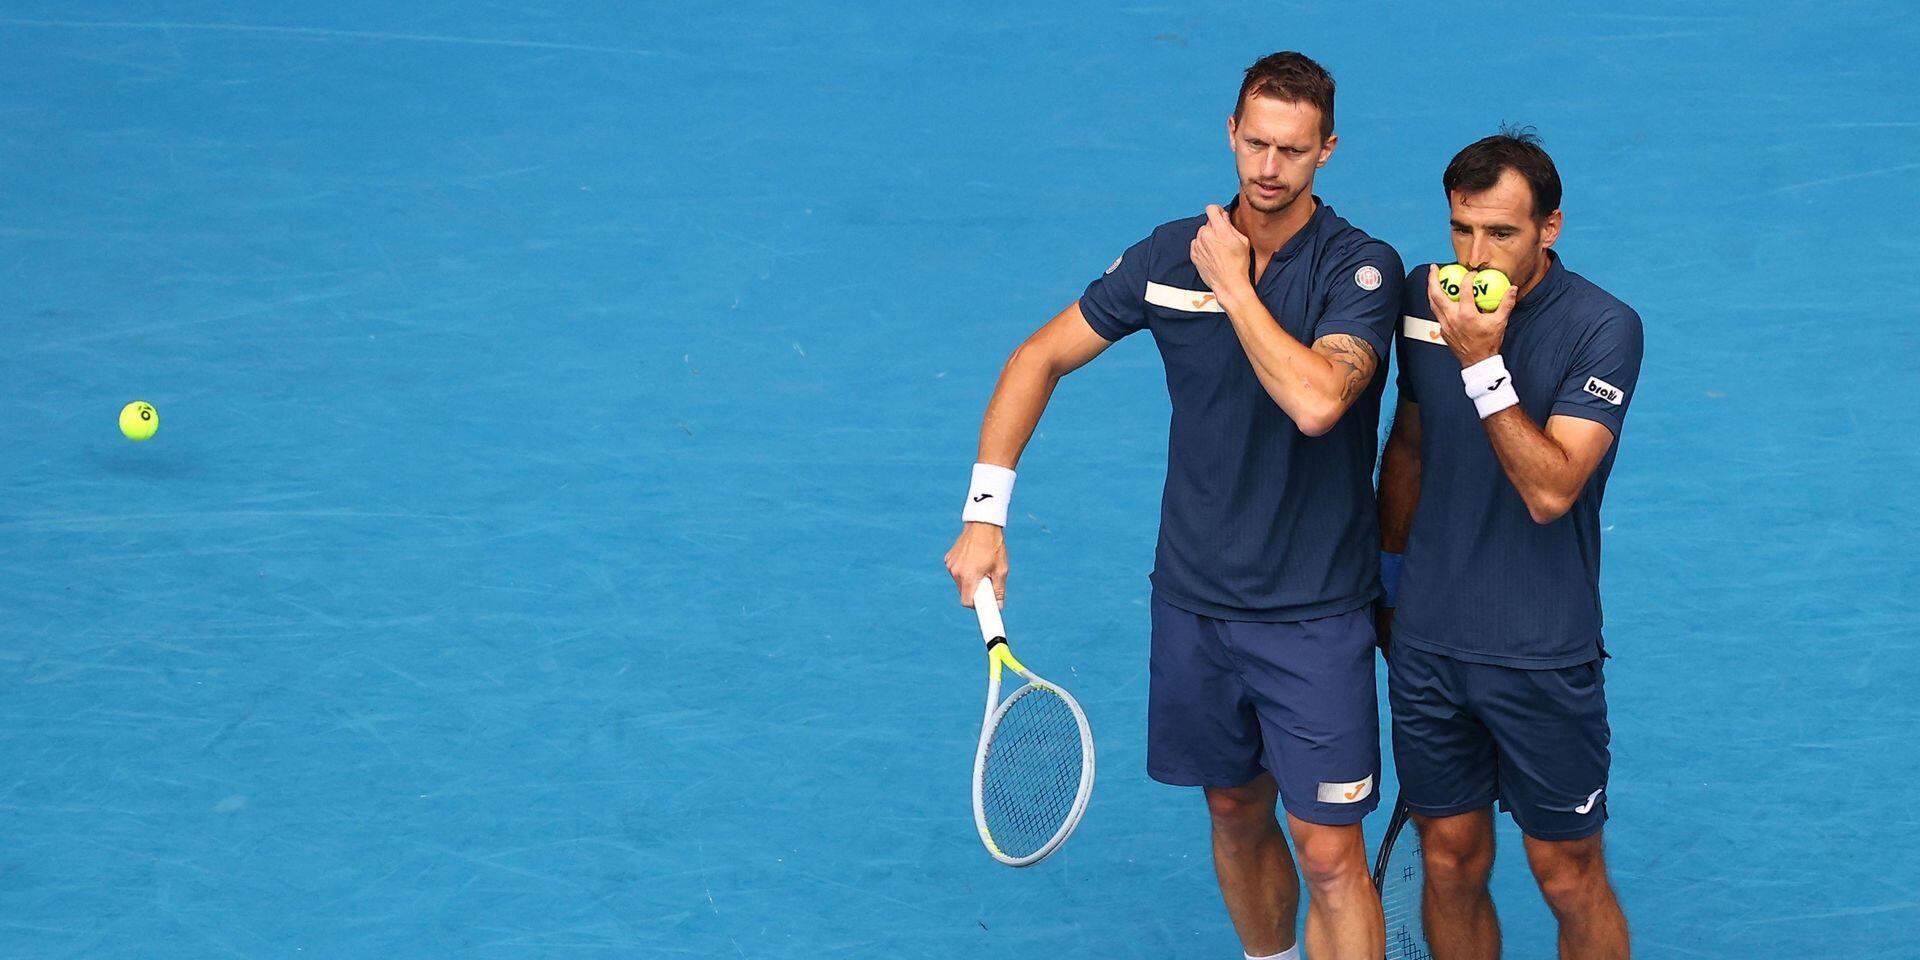 Open d'Australie : Ivan Dodig et Filip Polasek s'imposent et privent Rajeev Ram et Joe Salisbury d'un doublé